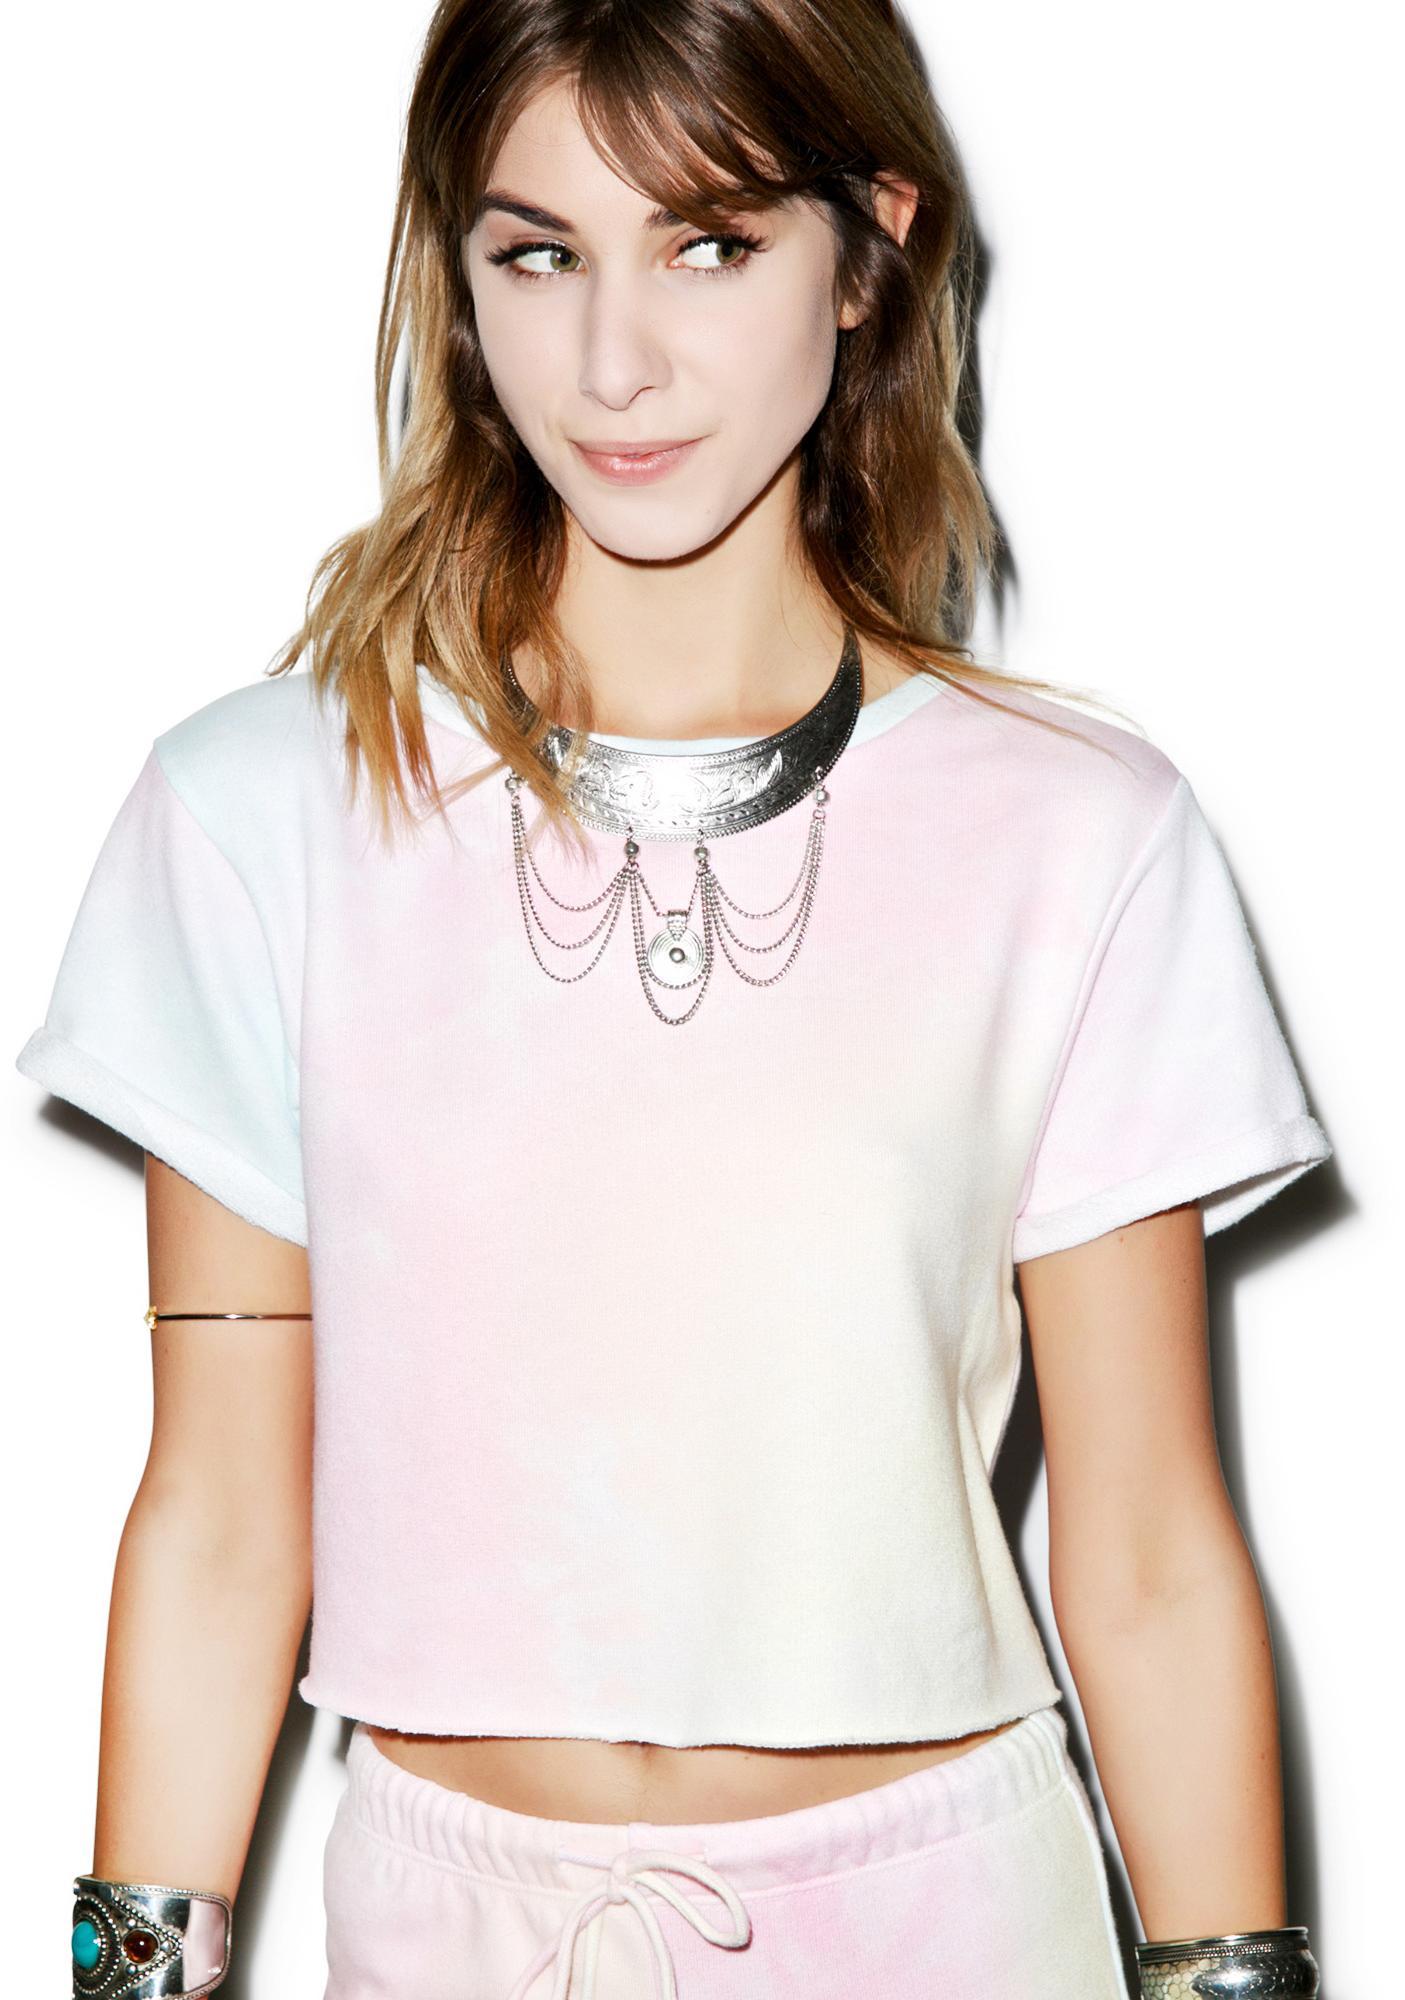 Wildfox Couture Dream Tie Dye Venice Crop Top